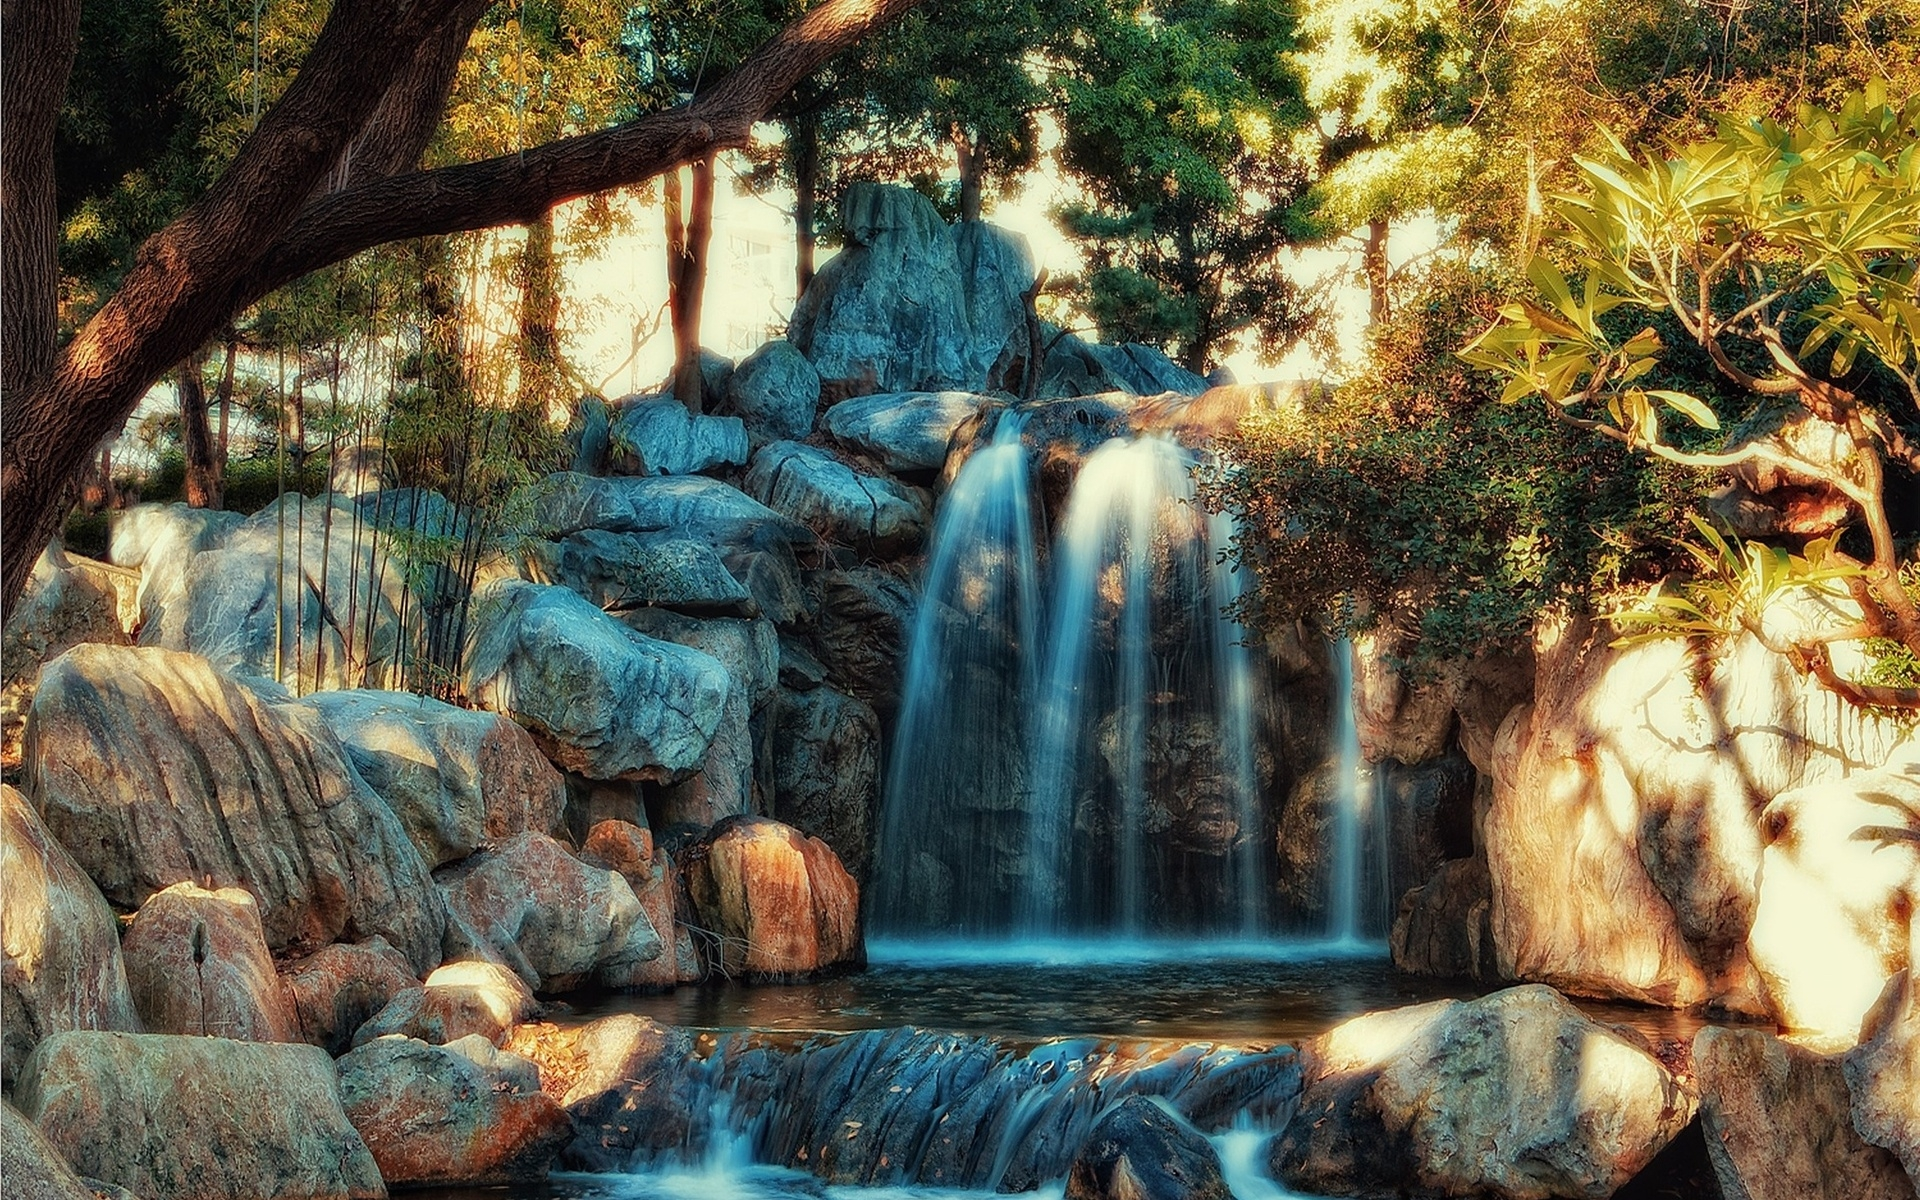 Картинки водопад, скалы, вода, река, HDR фото и обои на рабочий стол